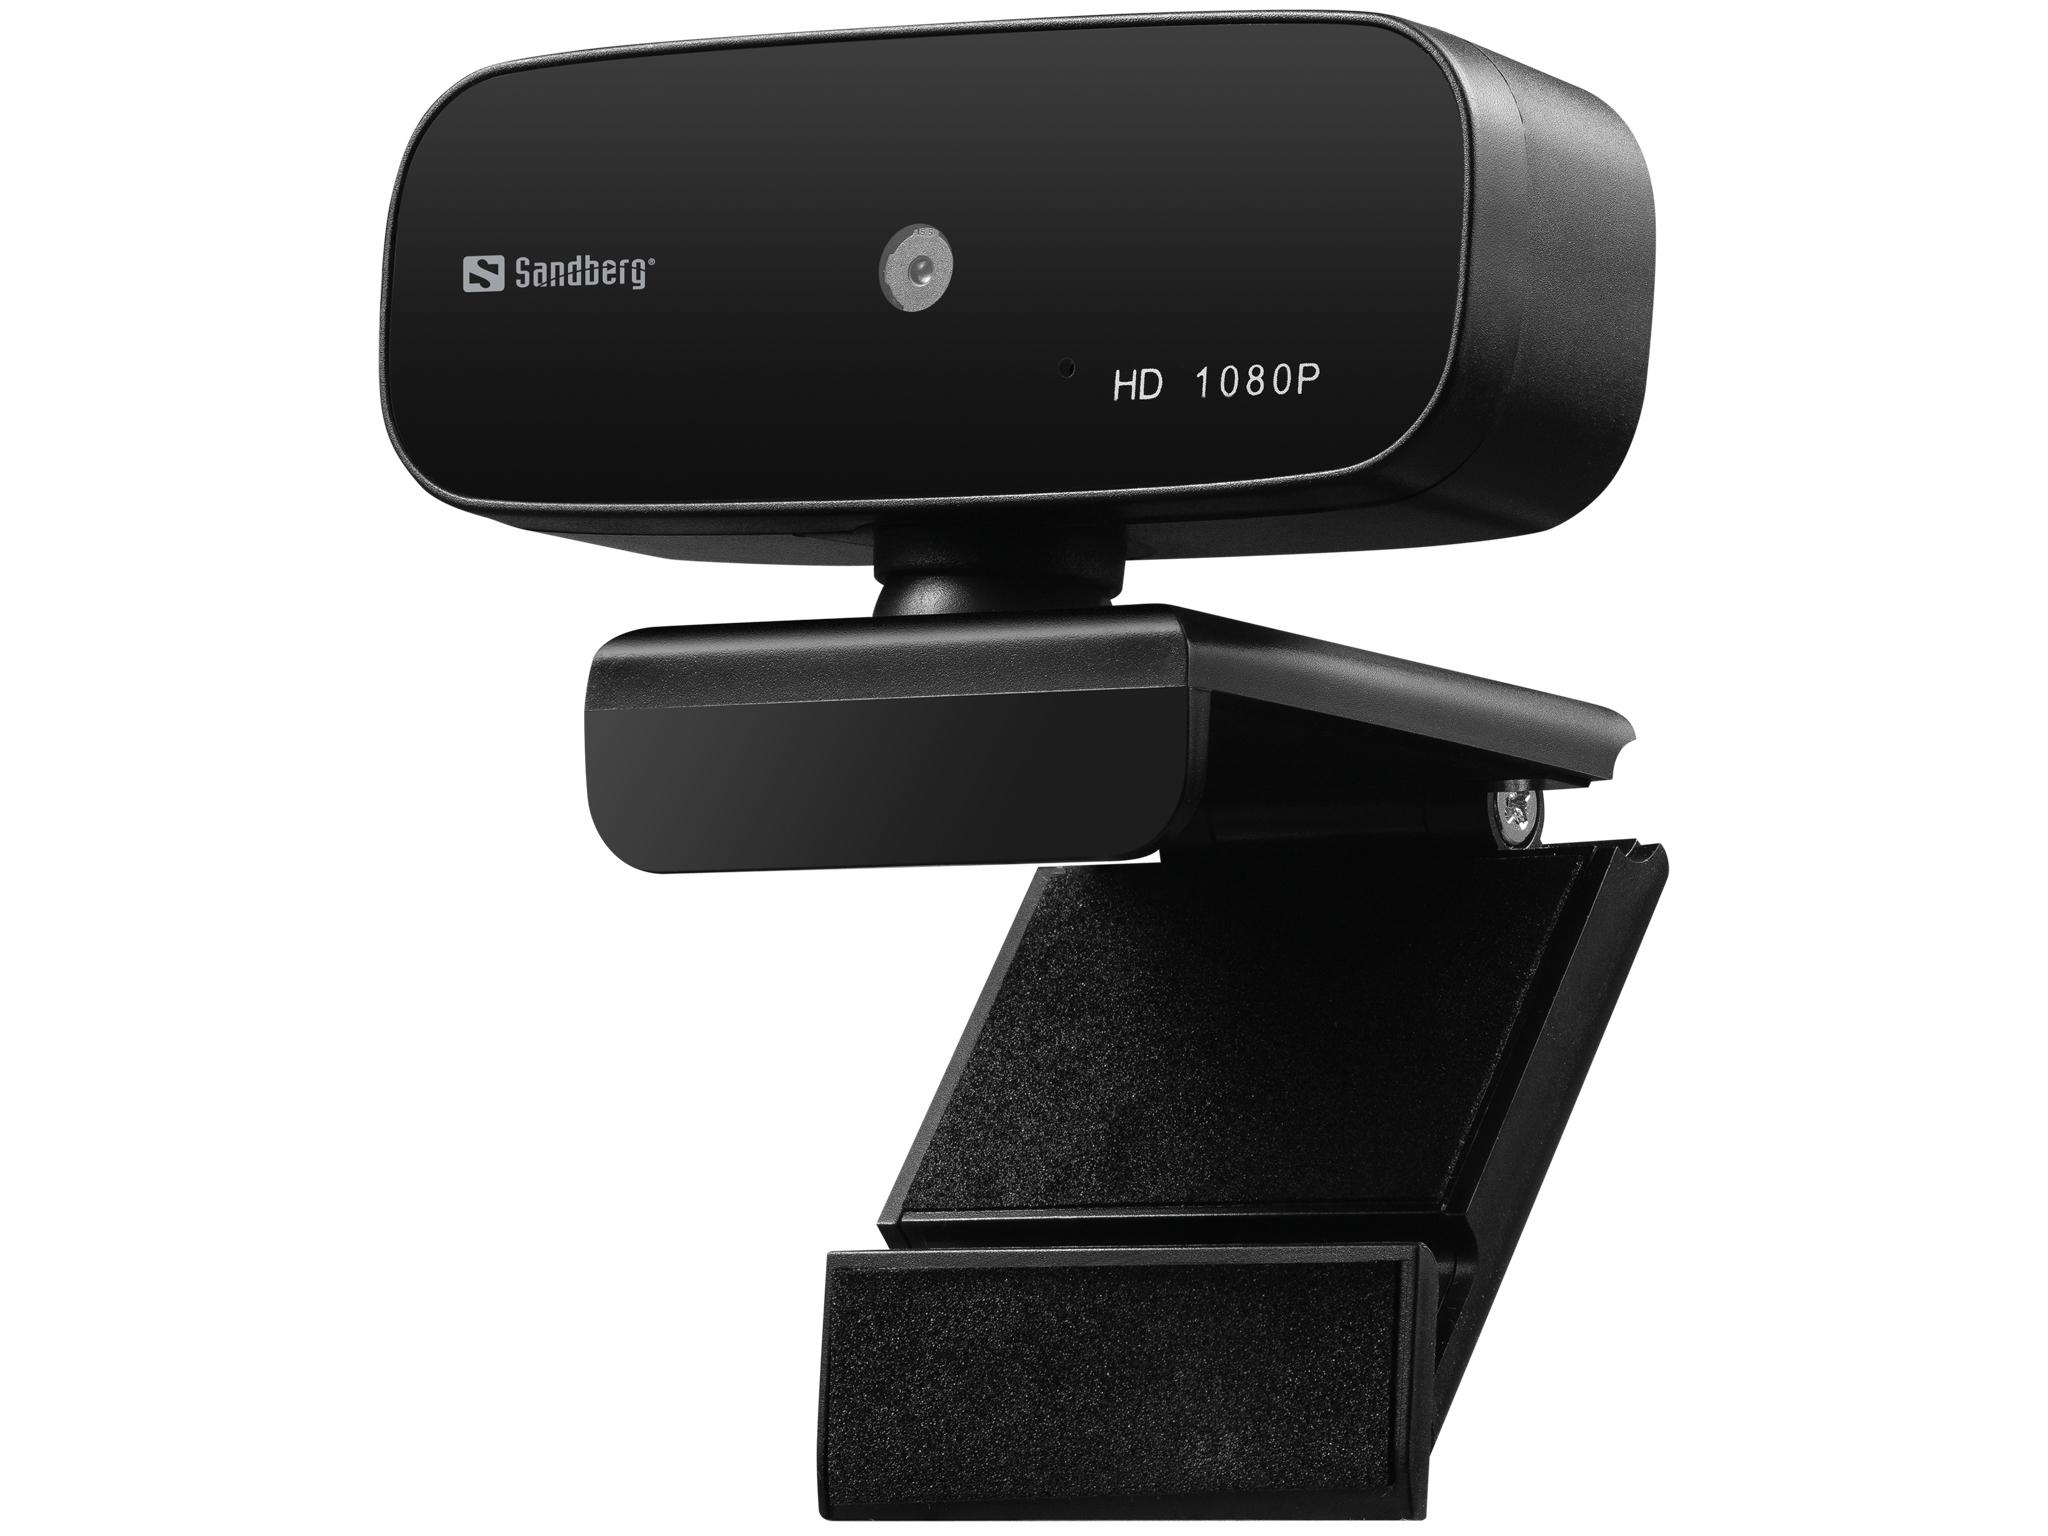 Sandberg USB Webcam Autofocus 1080P HD